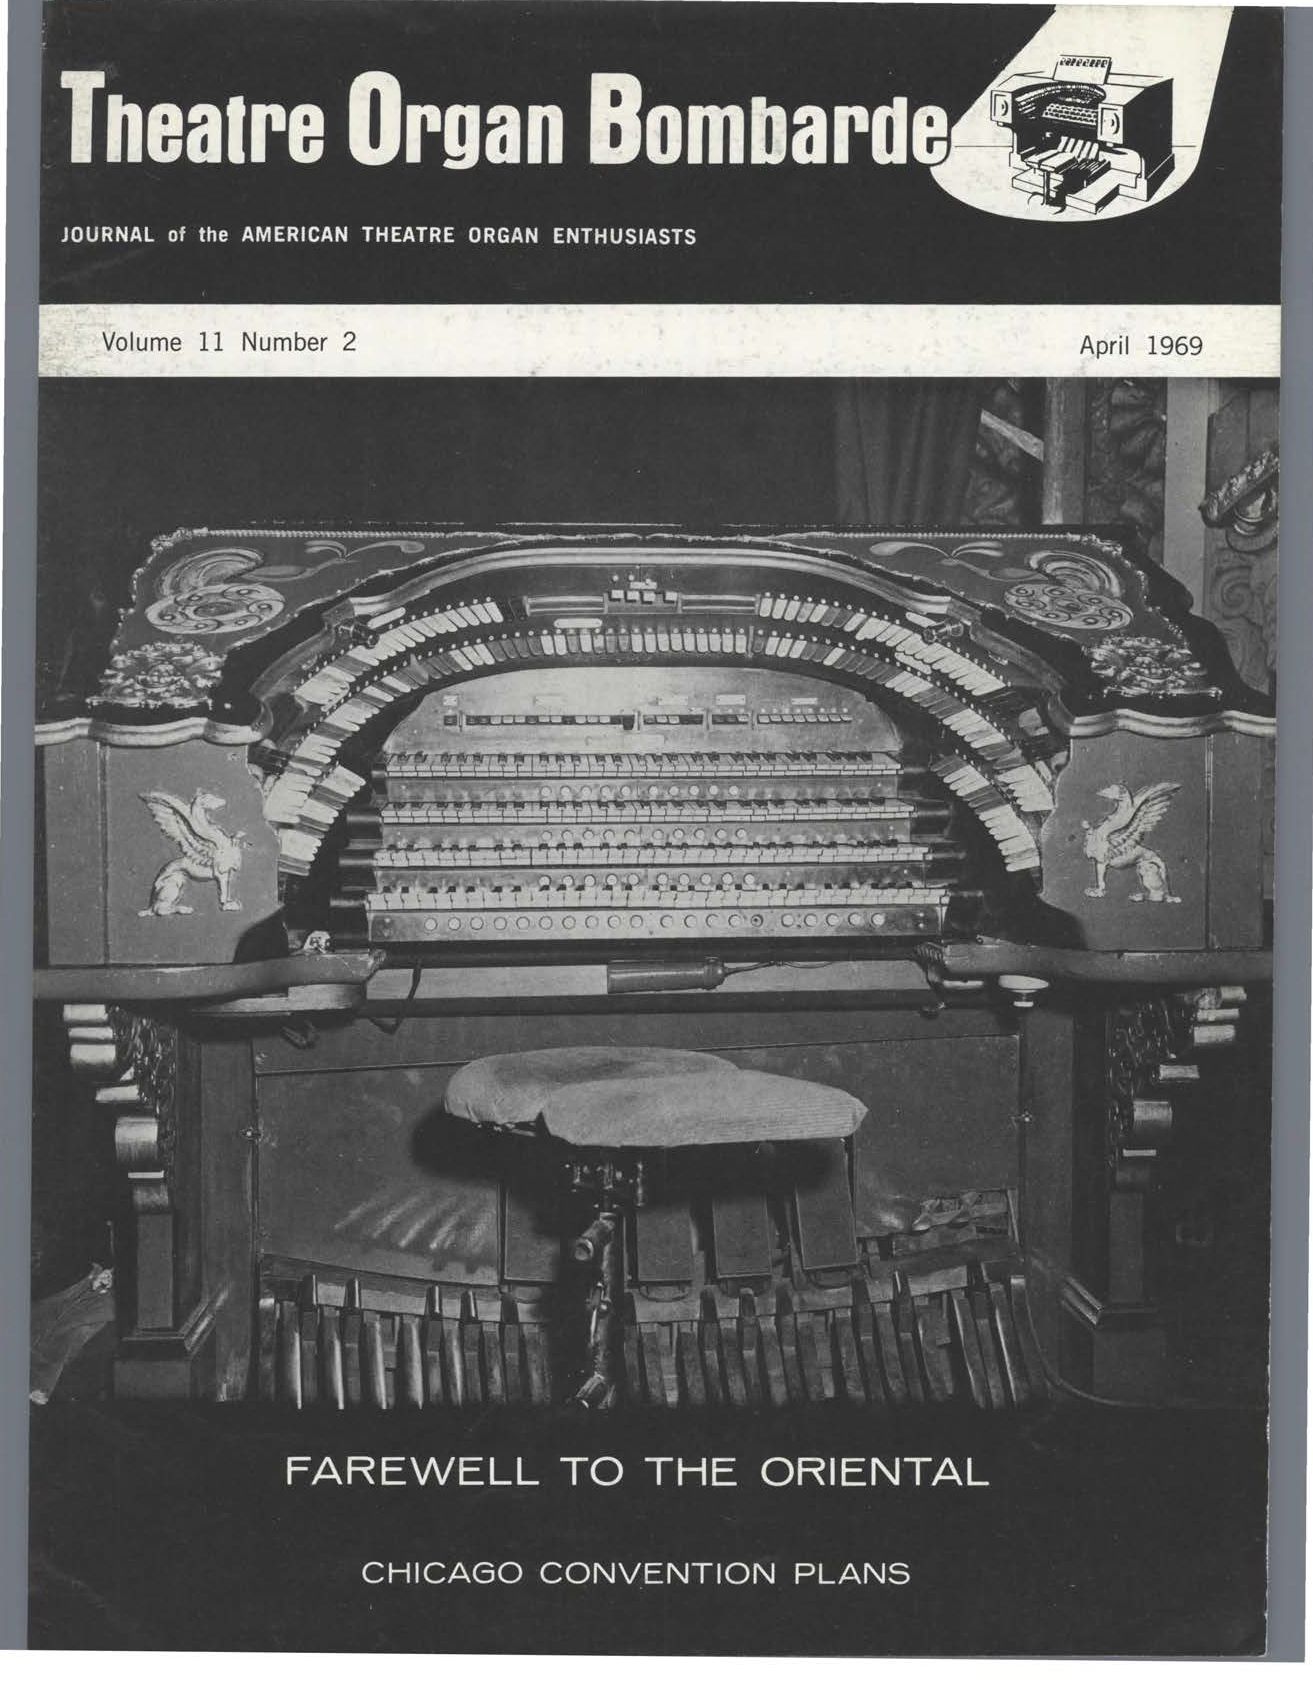 Theatre Organ, April 1969, Volume 11, Number 2